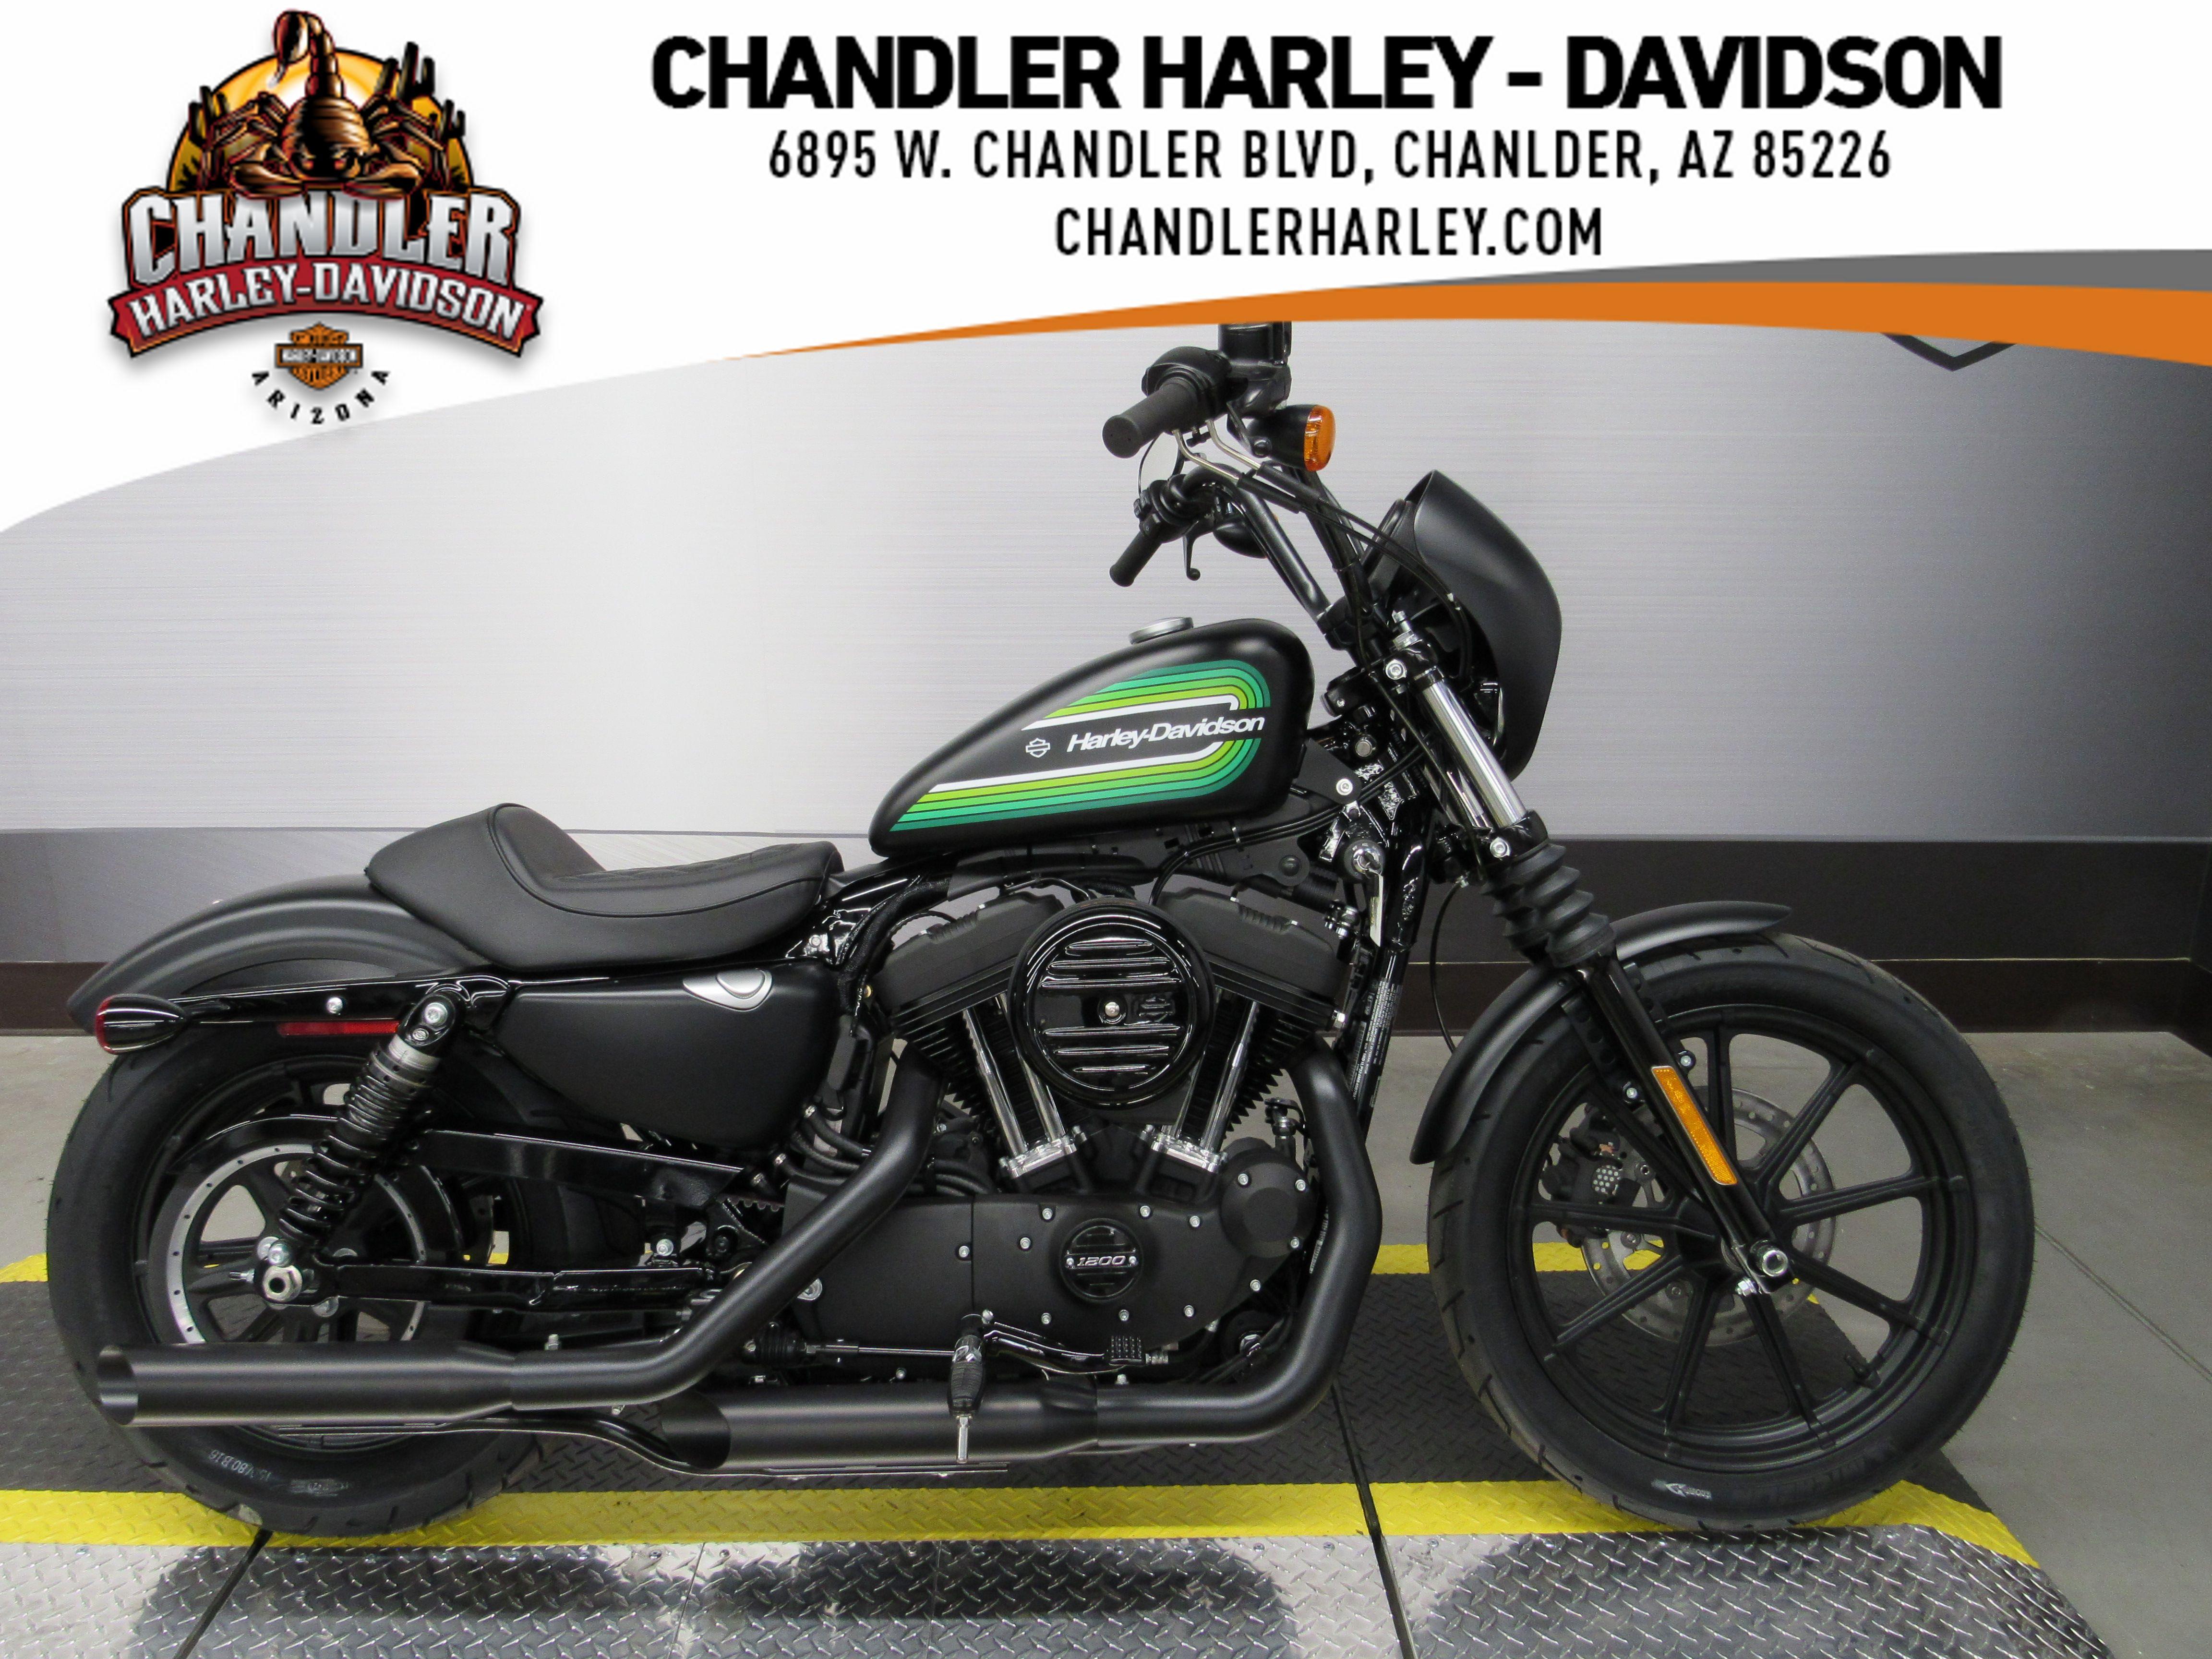 2021 Harley-Davidson Iron 1200 (XL1200NS)